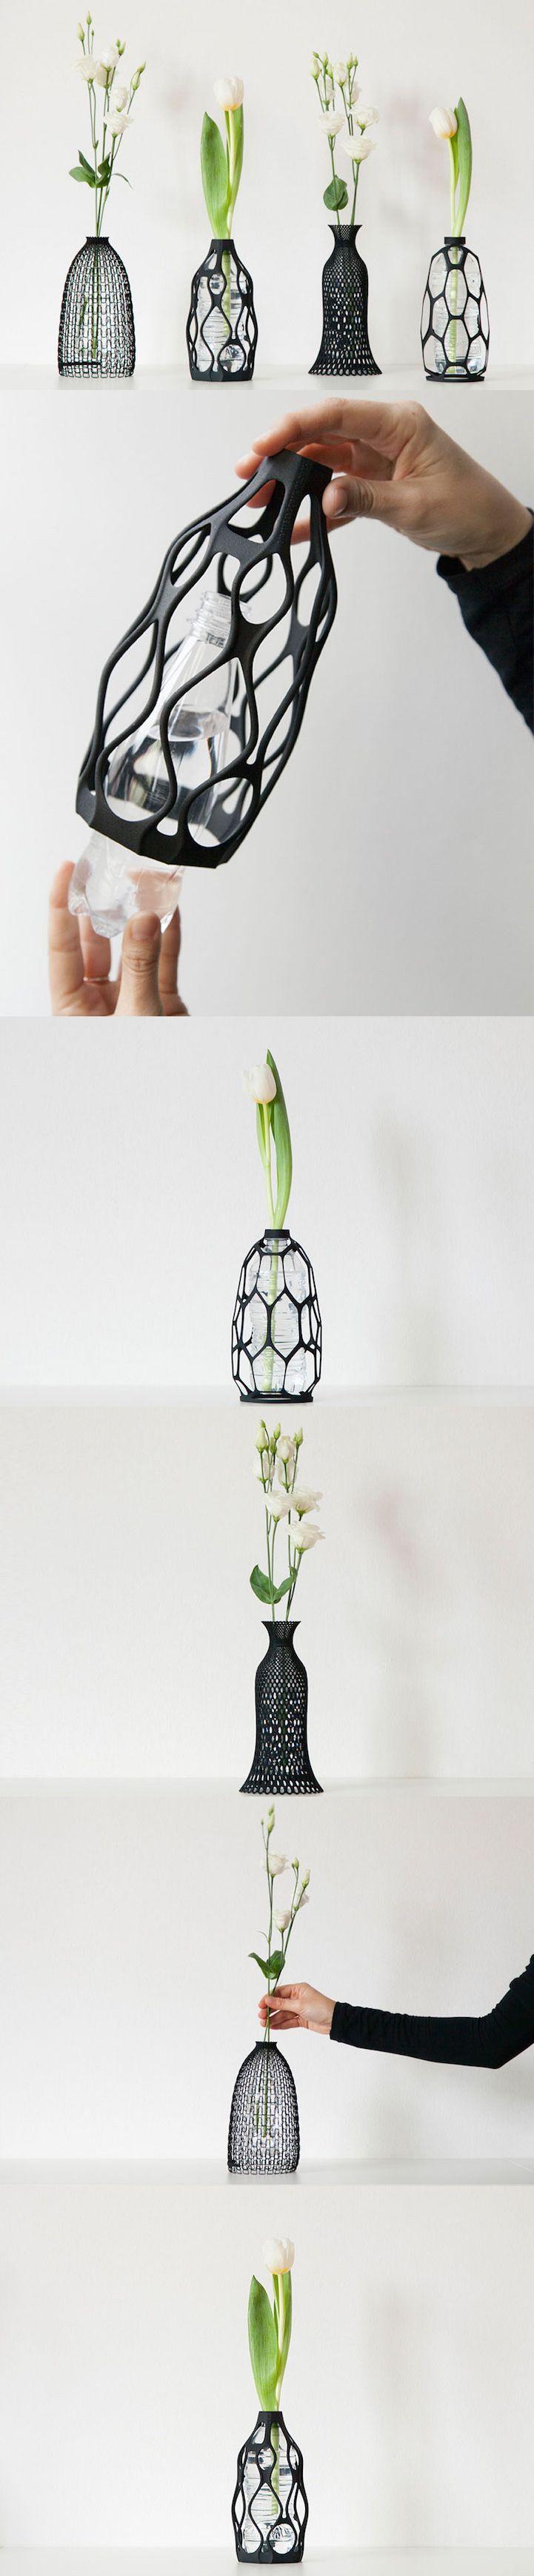 DesignLibero has reimagined recycling as an art form.